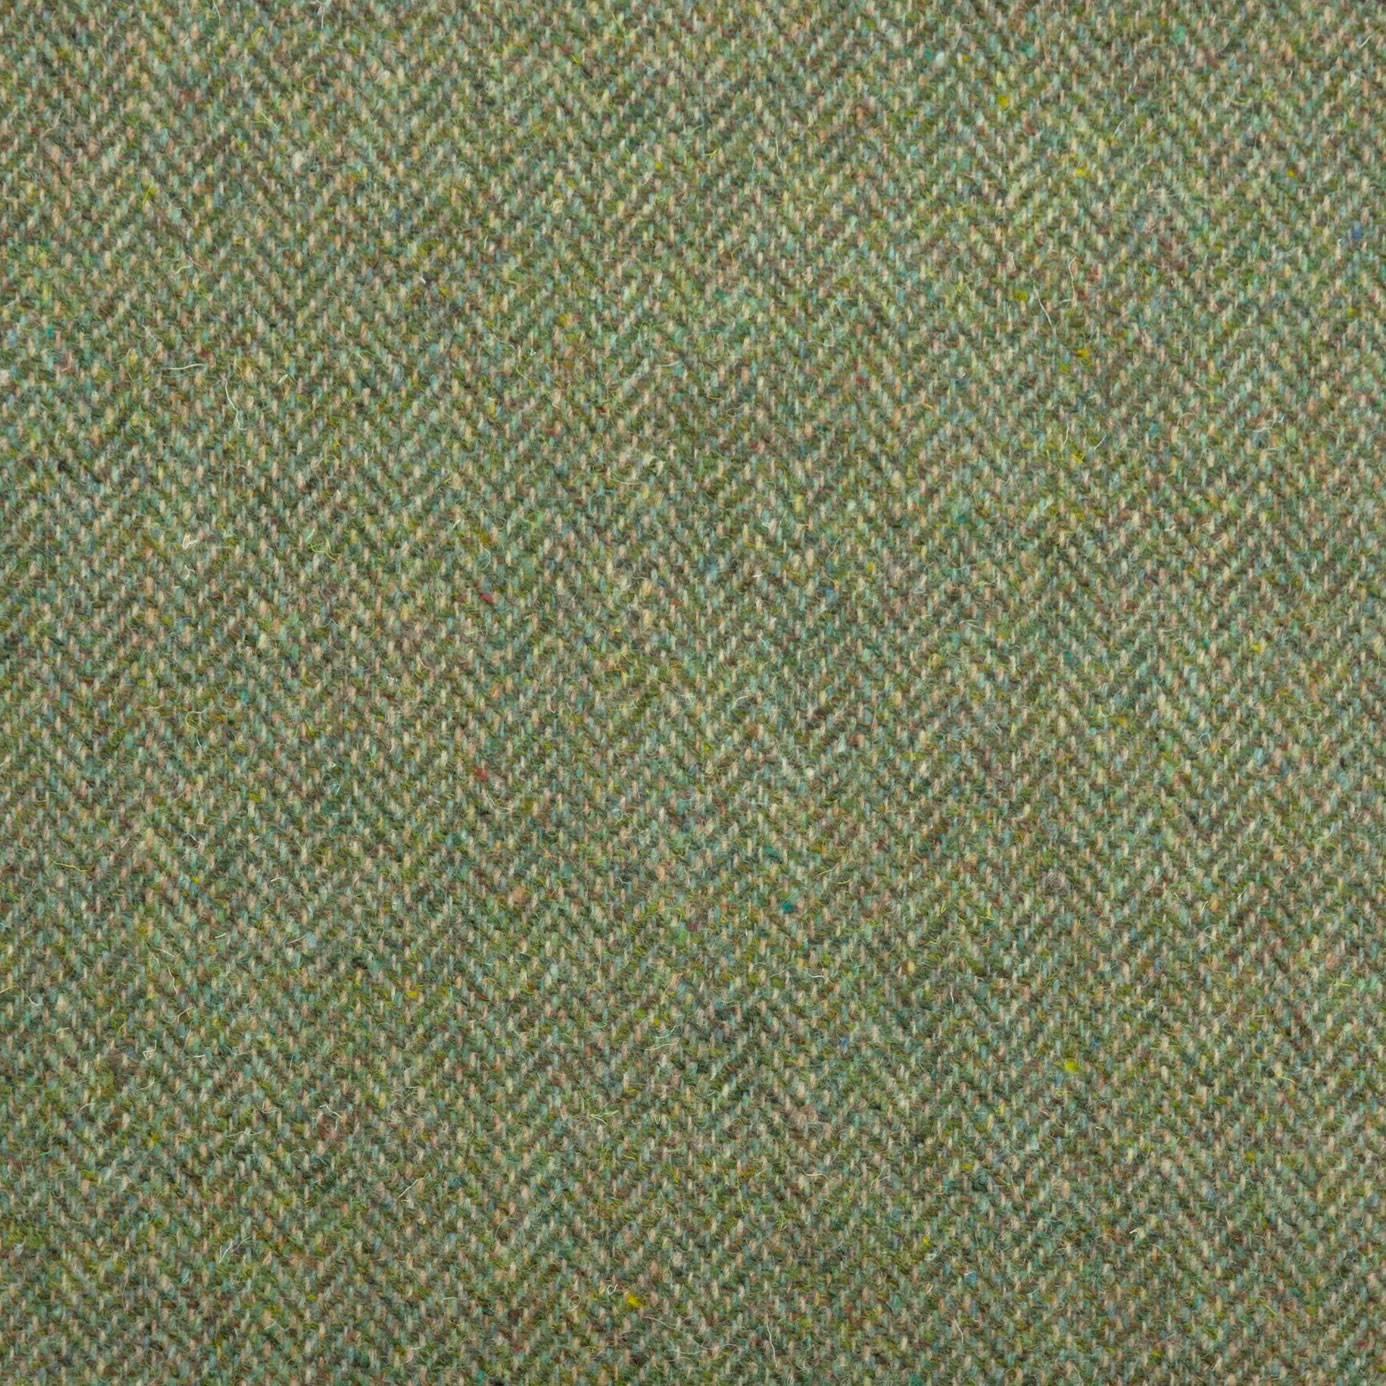 Roman Blinds in Art of the Loom Herringbone Fabric - Mountain Bracken  Product Code: HERRINGBONEMOUNTAINBRACKEN